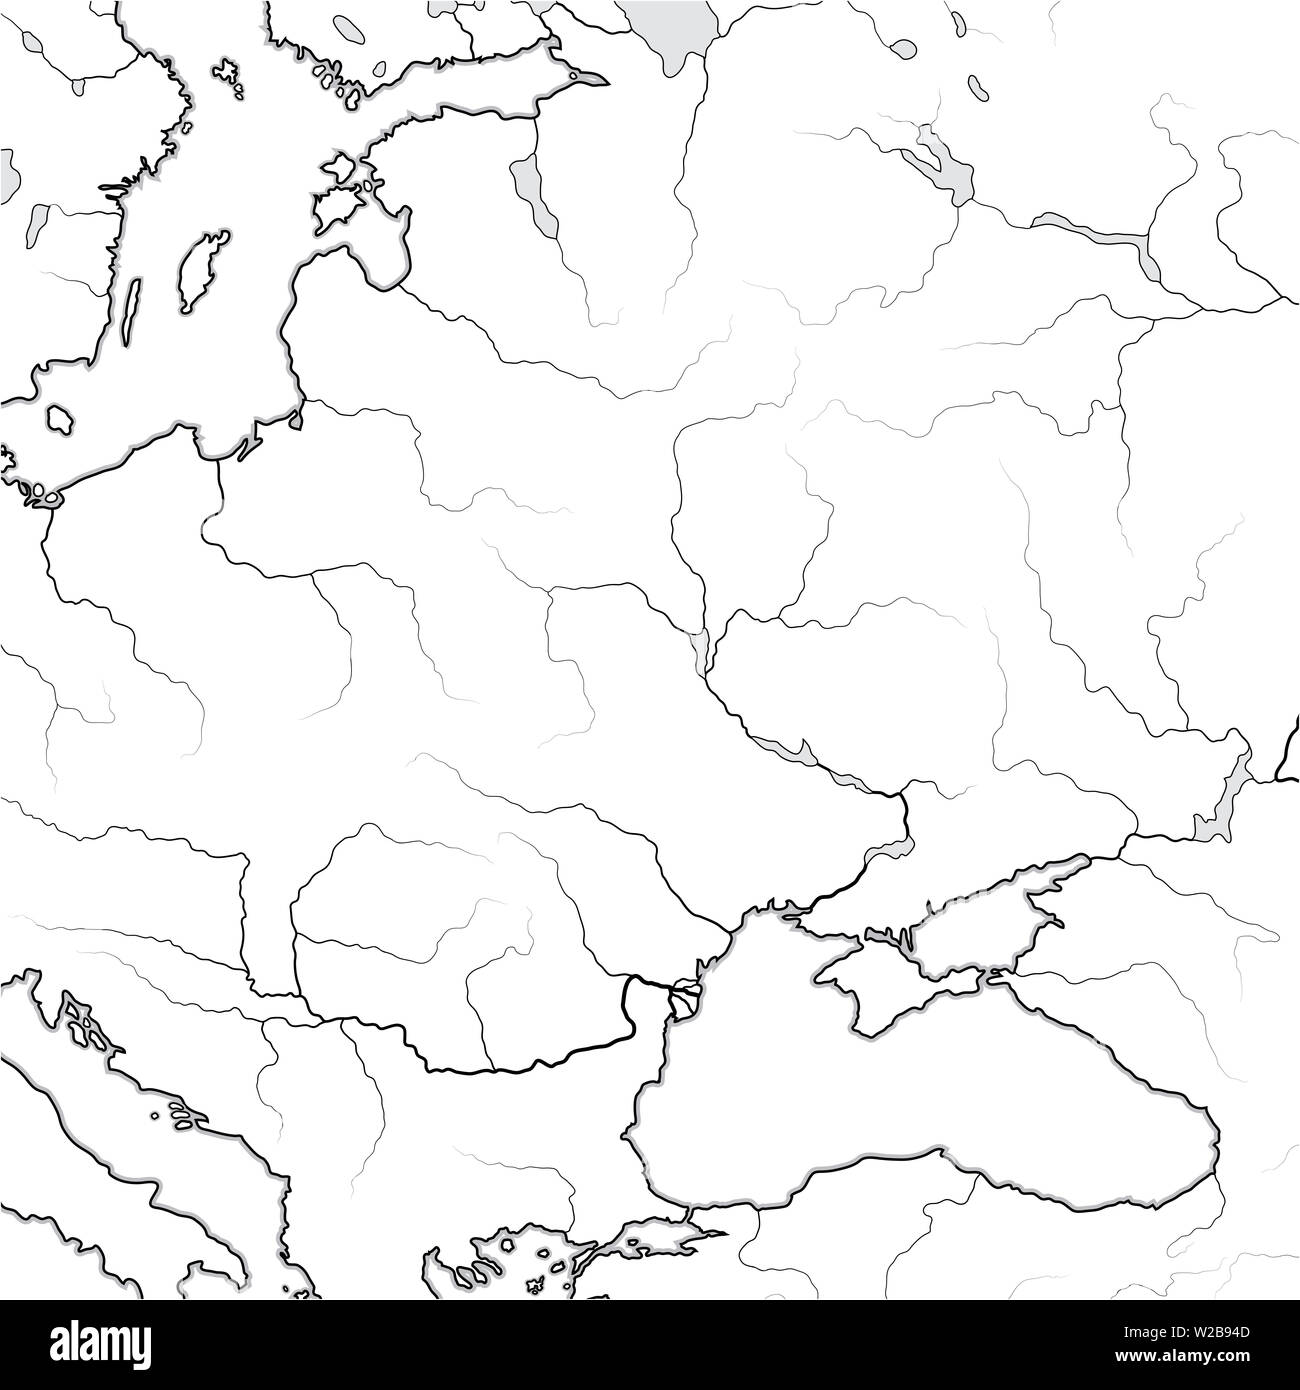 Jugoslawien Karte Früher.Map Russia Poland Ukraine Stockfotos Map Russia Poland Ukraine